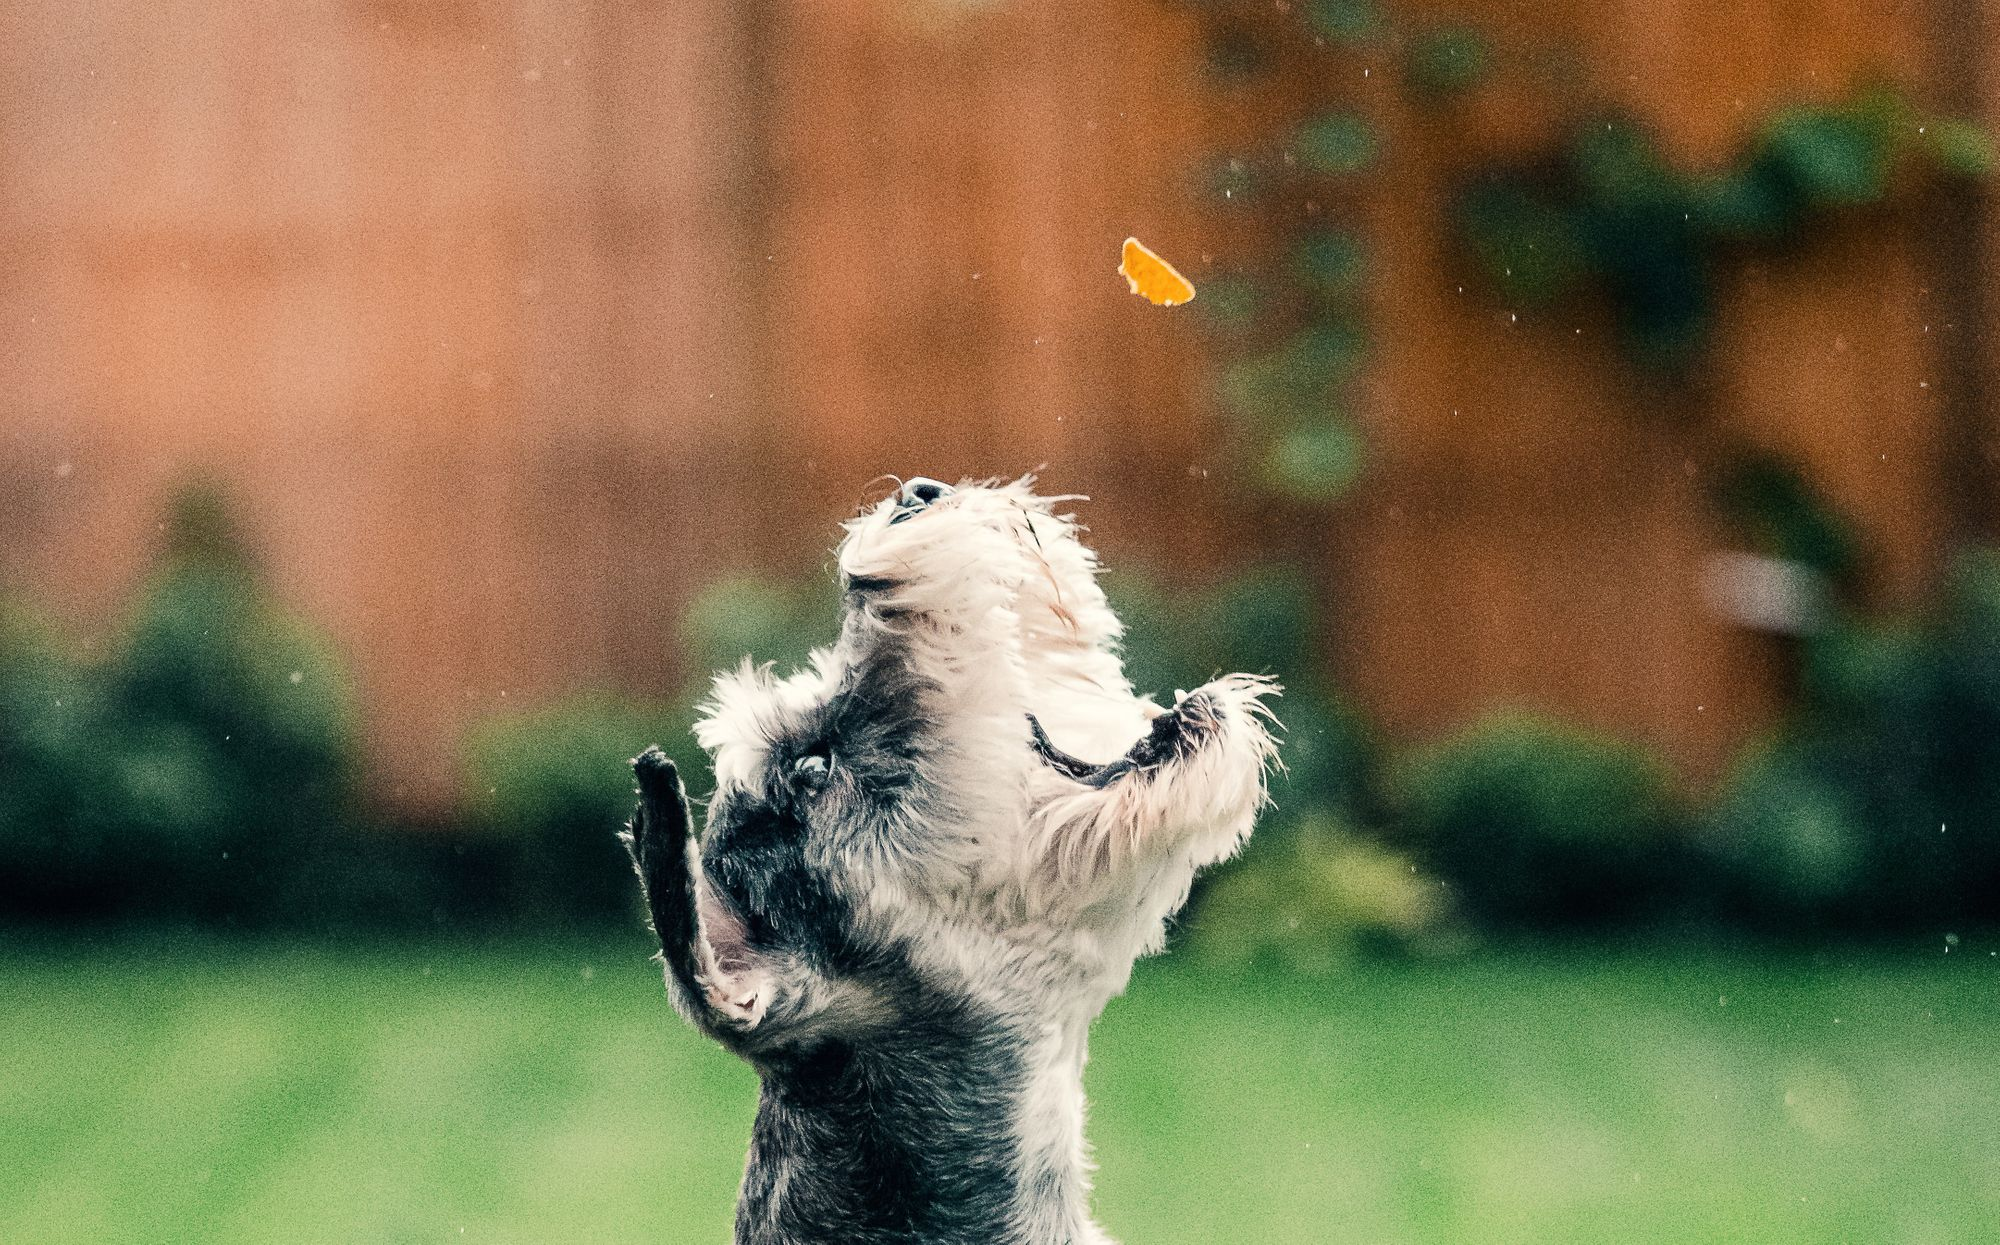 Dog catching a treat